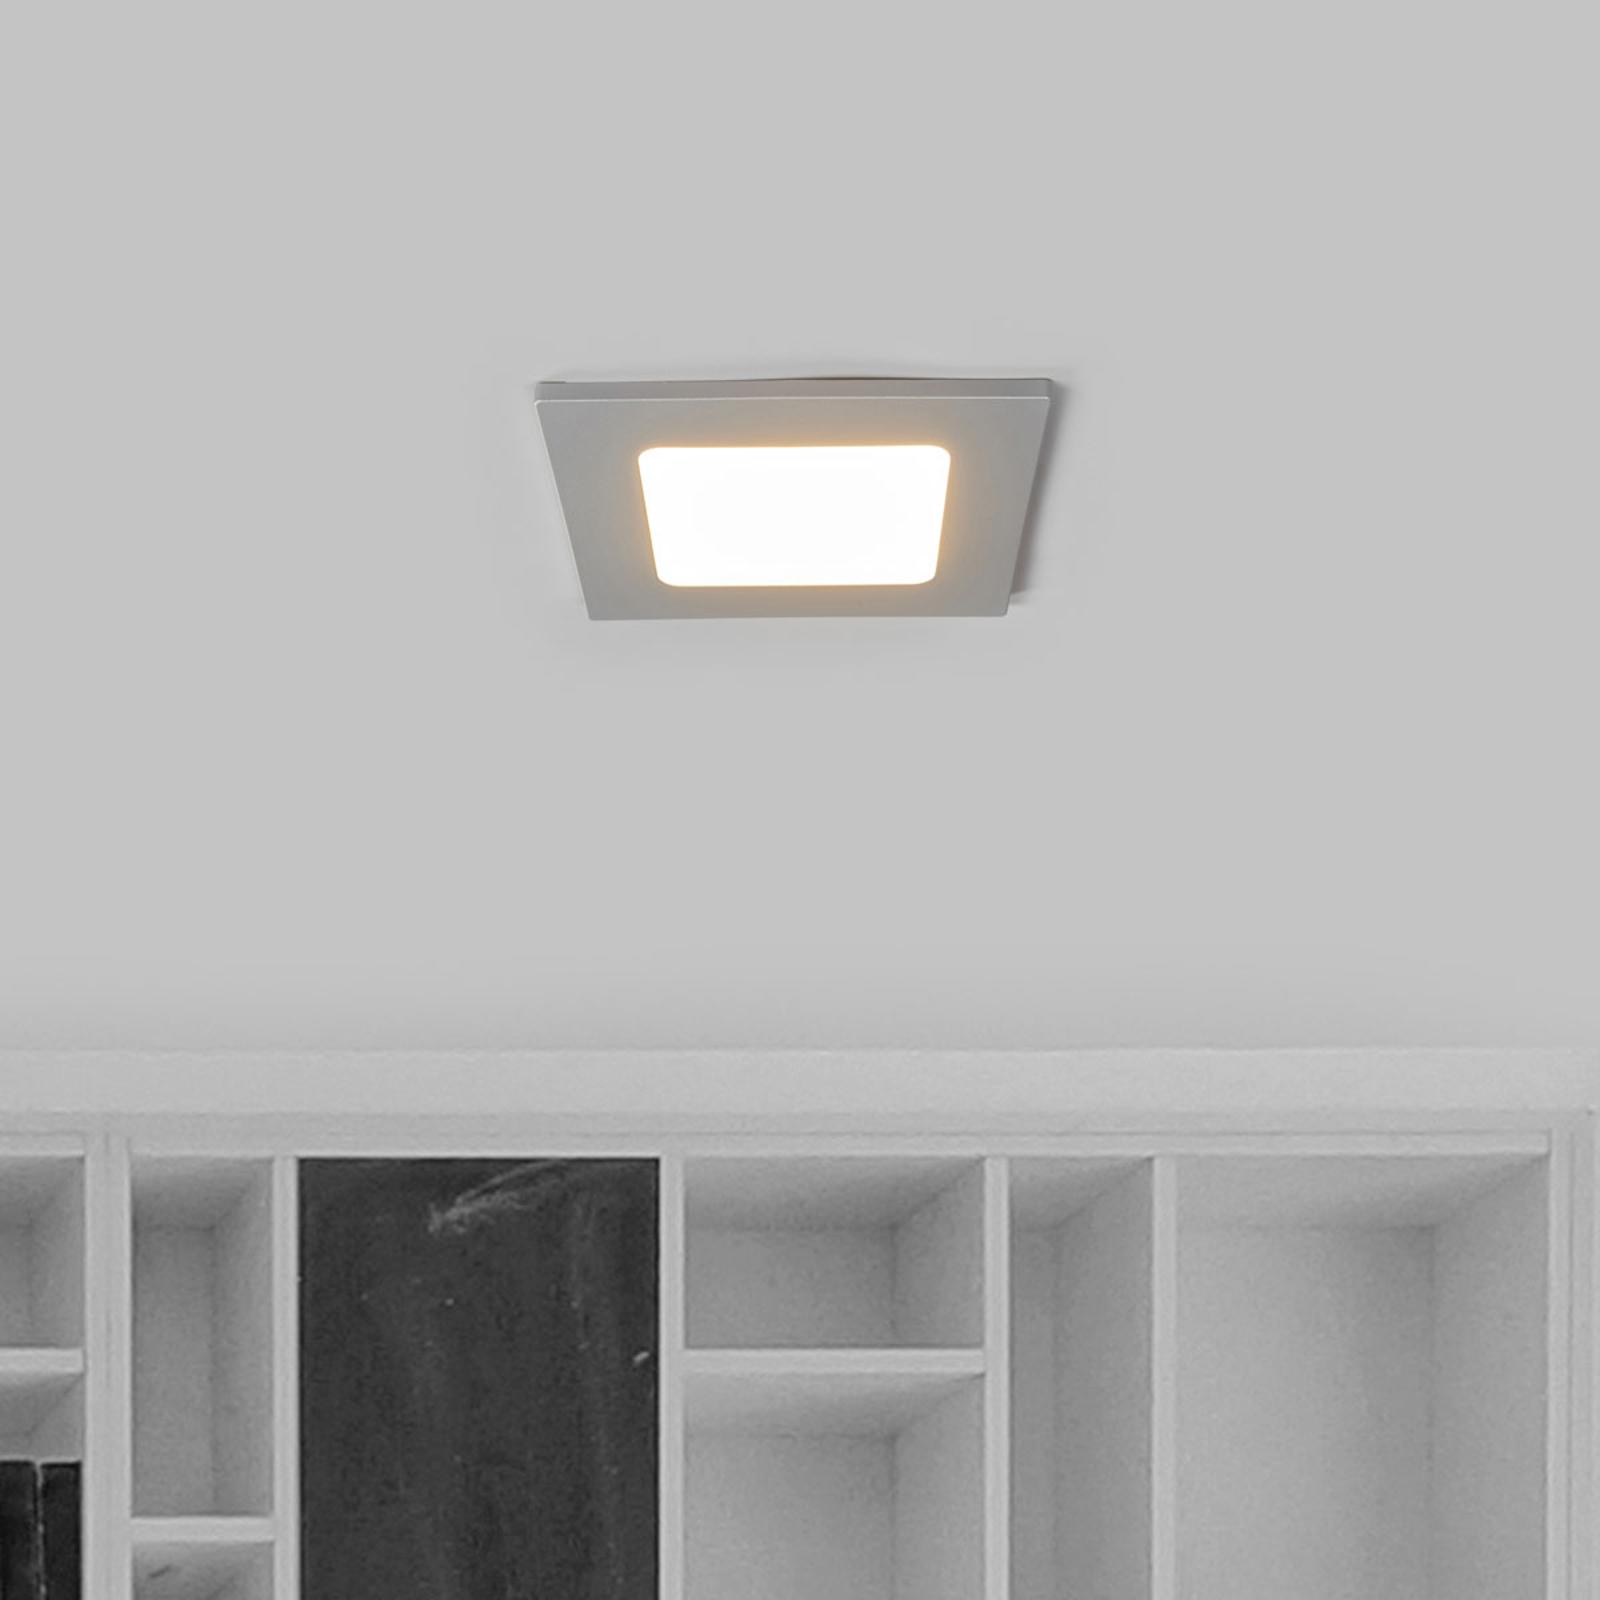 Foco empotrado LED Joki plata 3000K angular 11,5cm